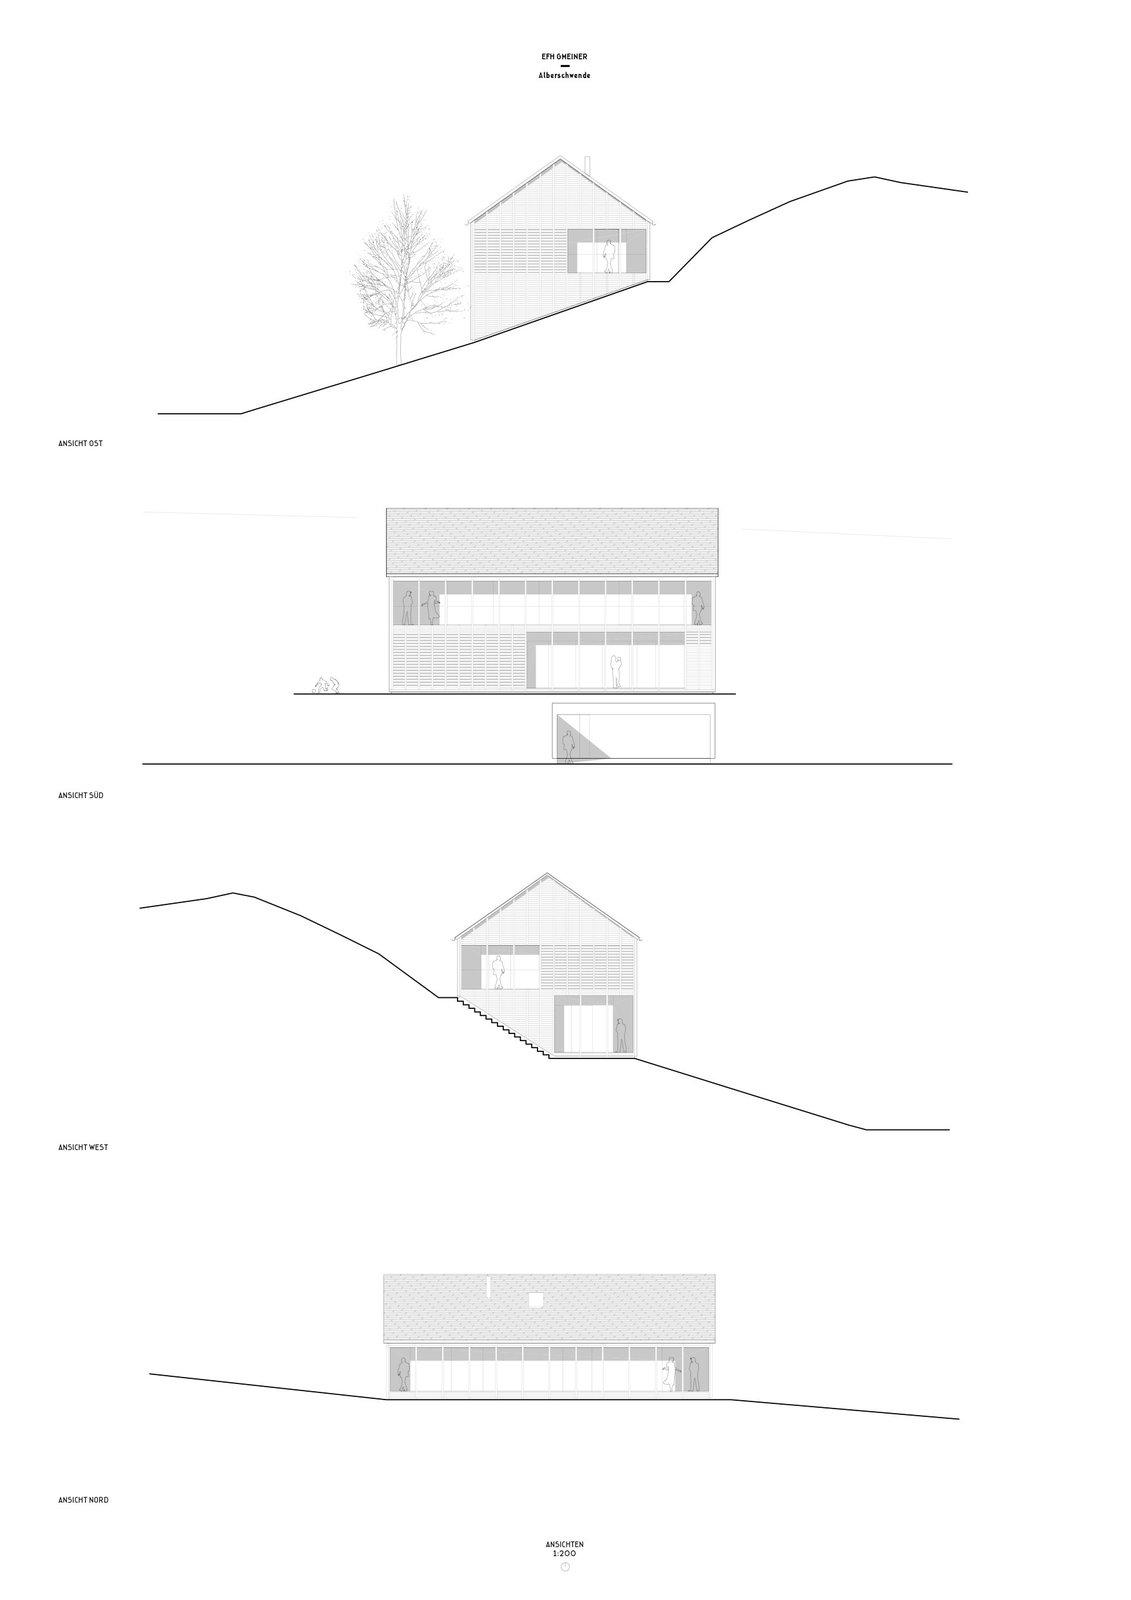 Höller House elevations